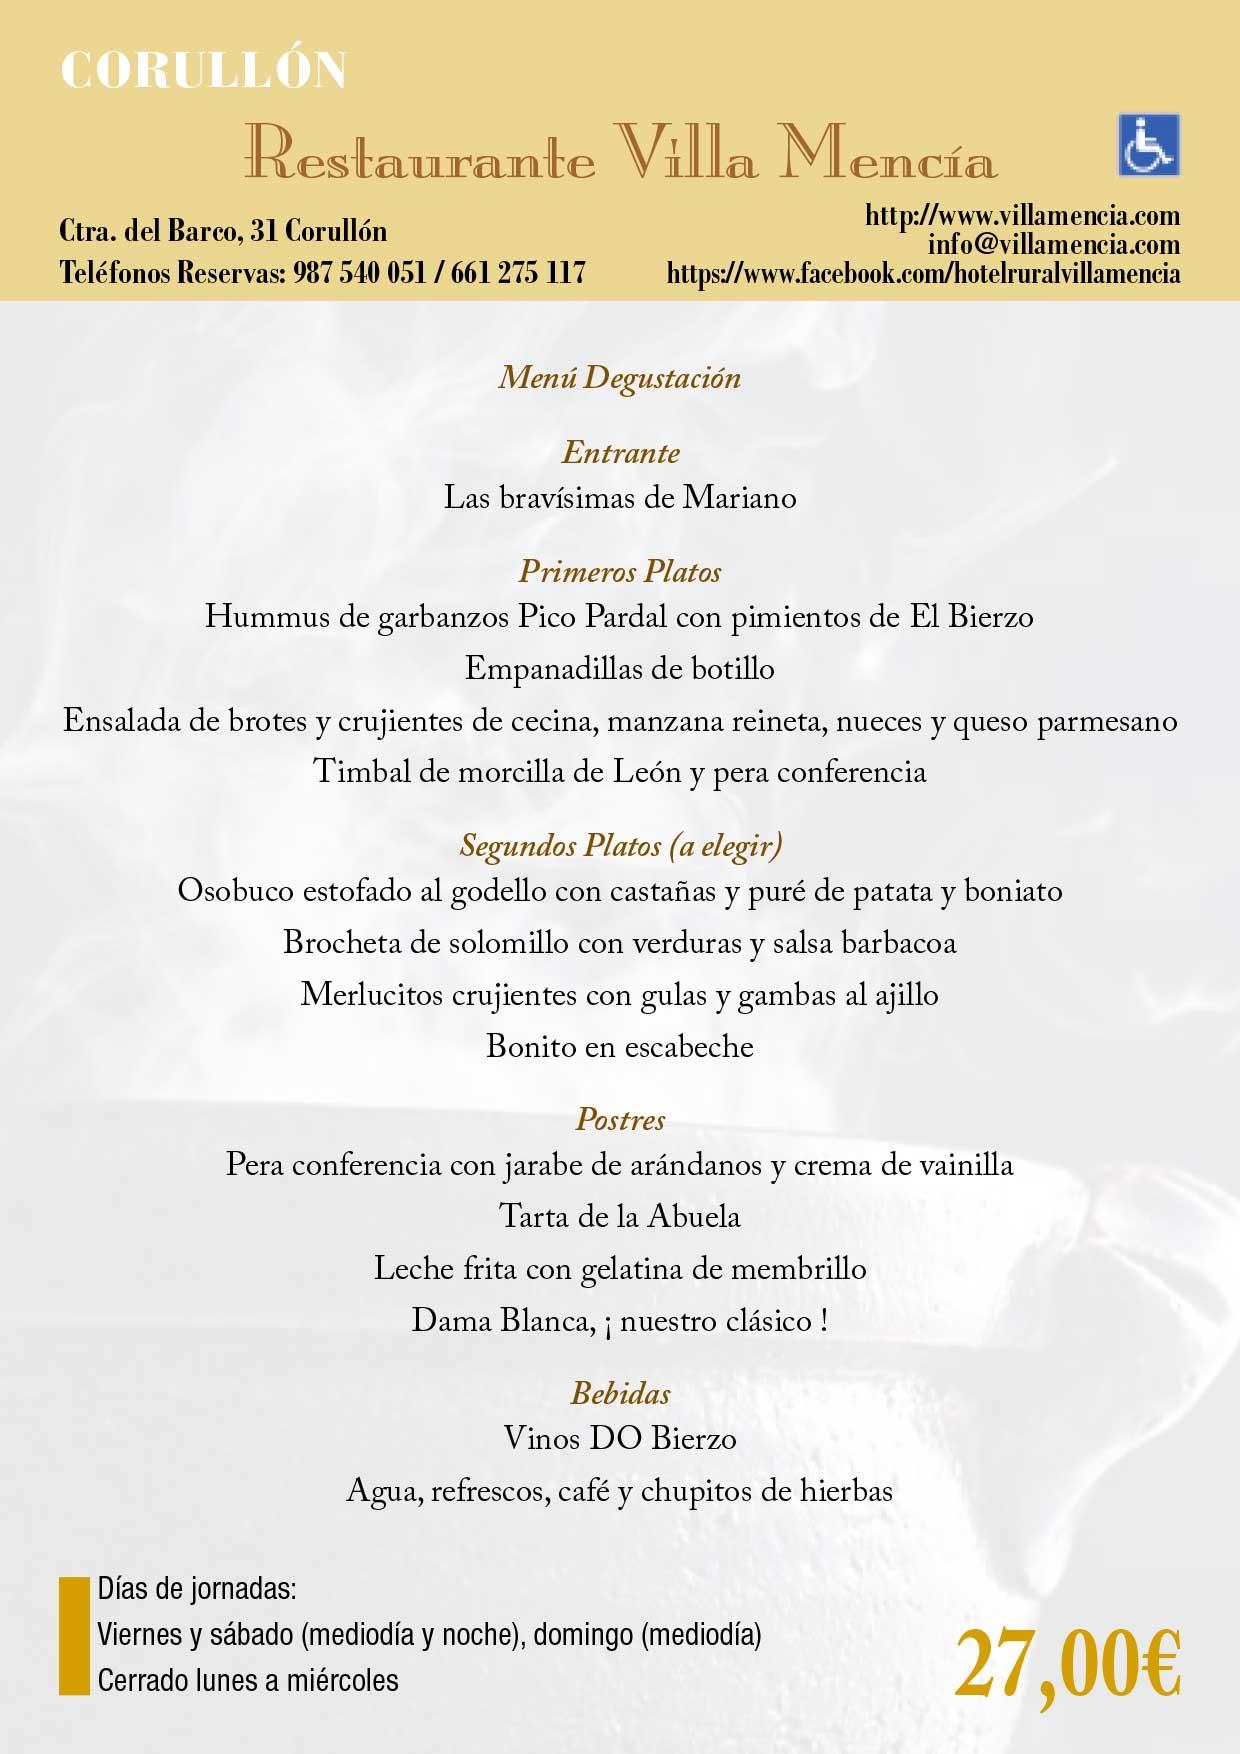 XXXIII Jornadas gastronómicas del Bierzo 2017. Restaurantes participantes 7